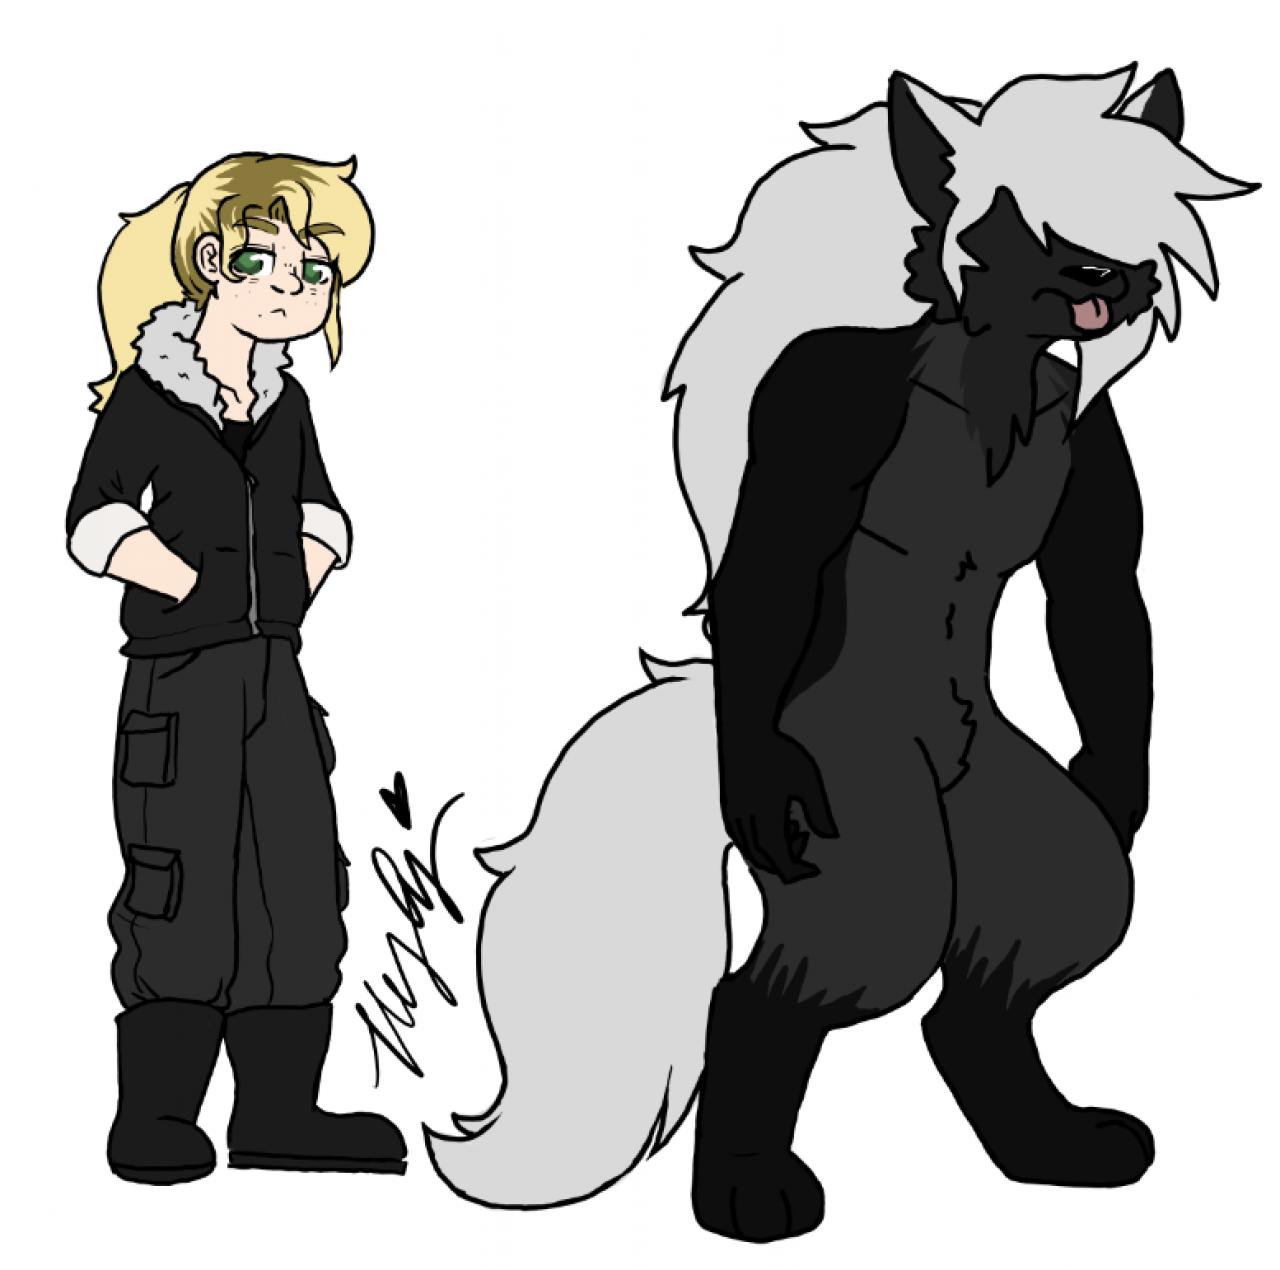 MeandWerewolfme